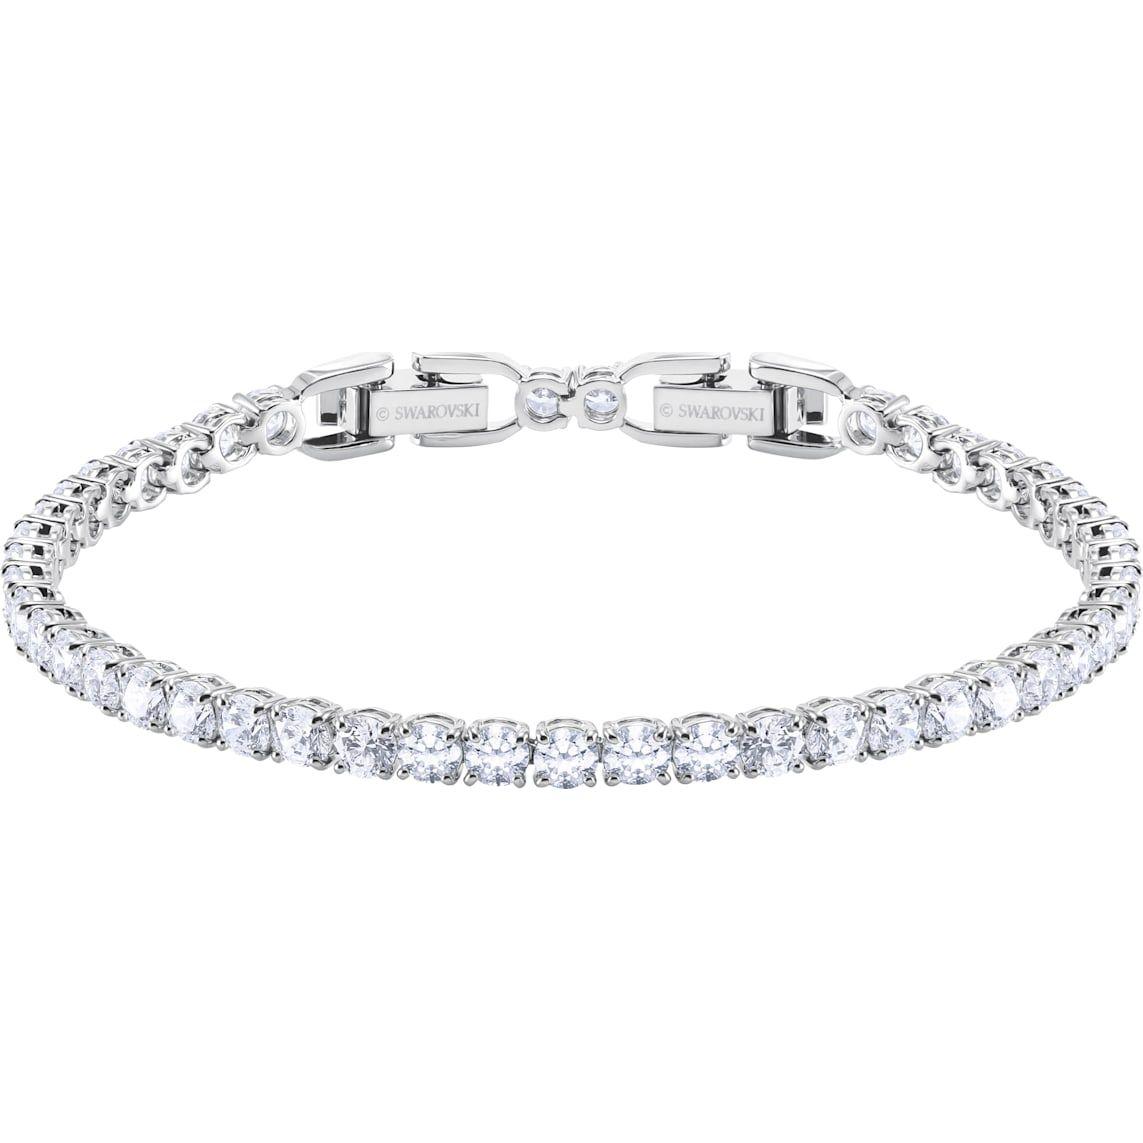 Tennis Deluxe Bracelet White Rhodium Plated Swarovski Bracelet Swarovski Jewelry Jewelry